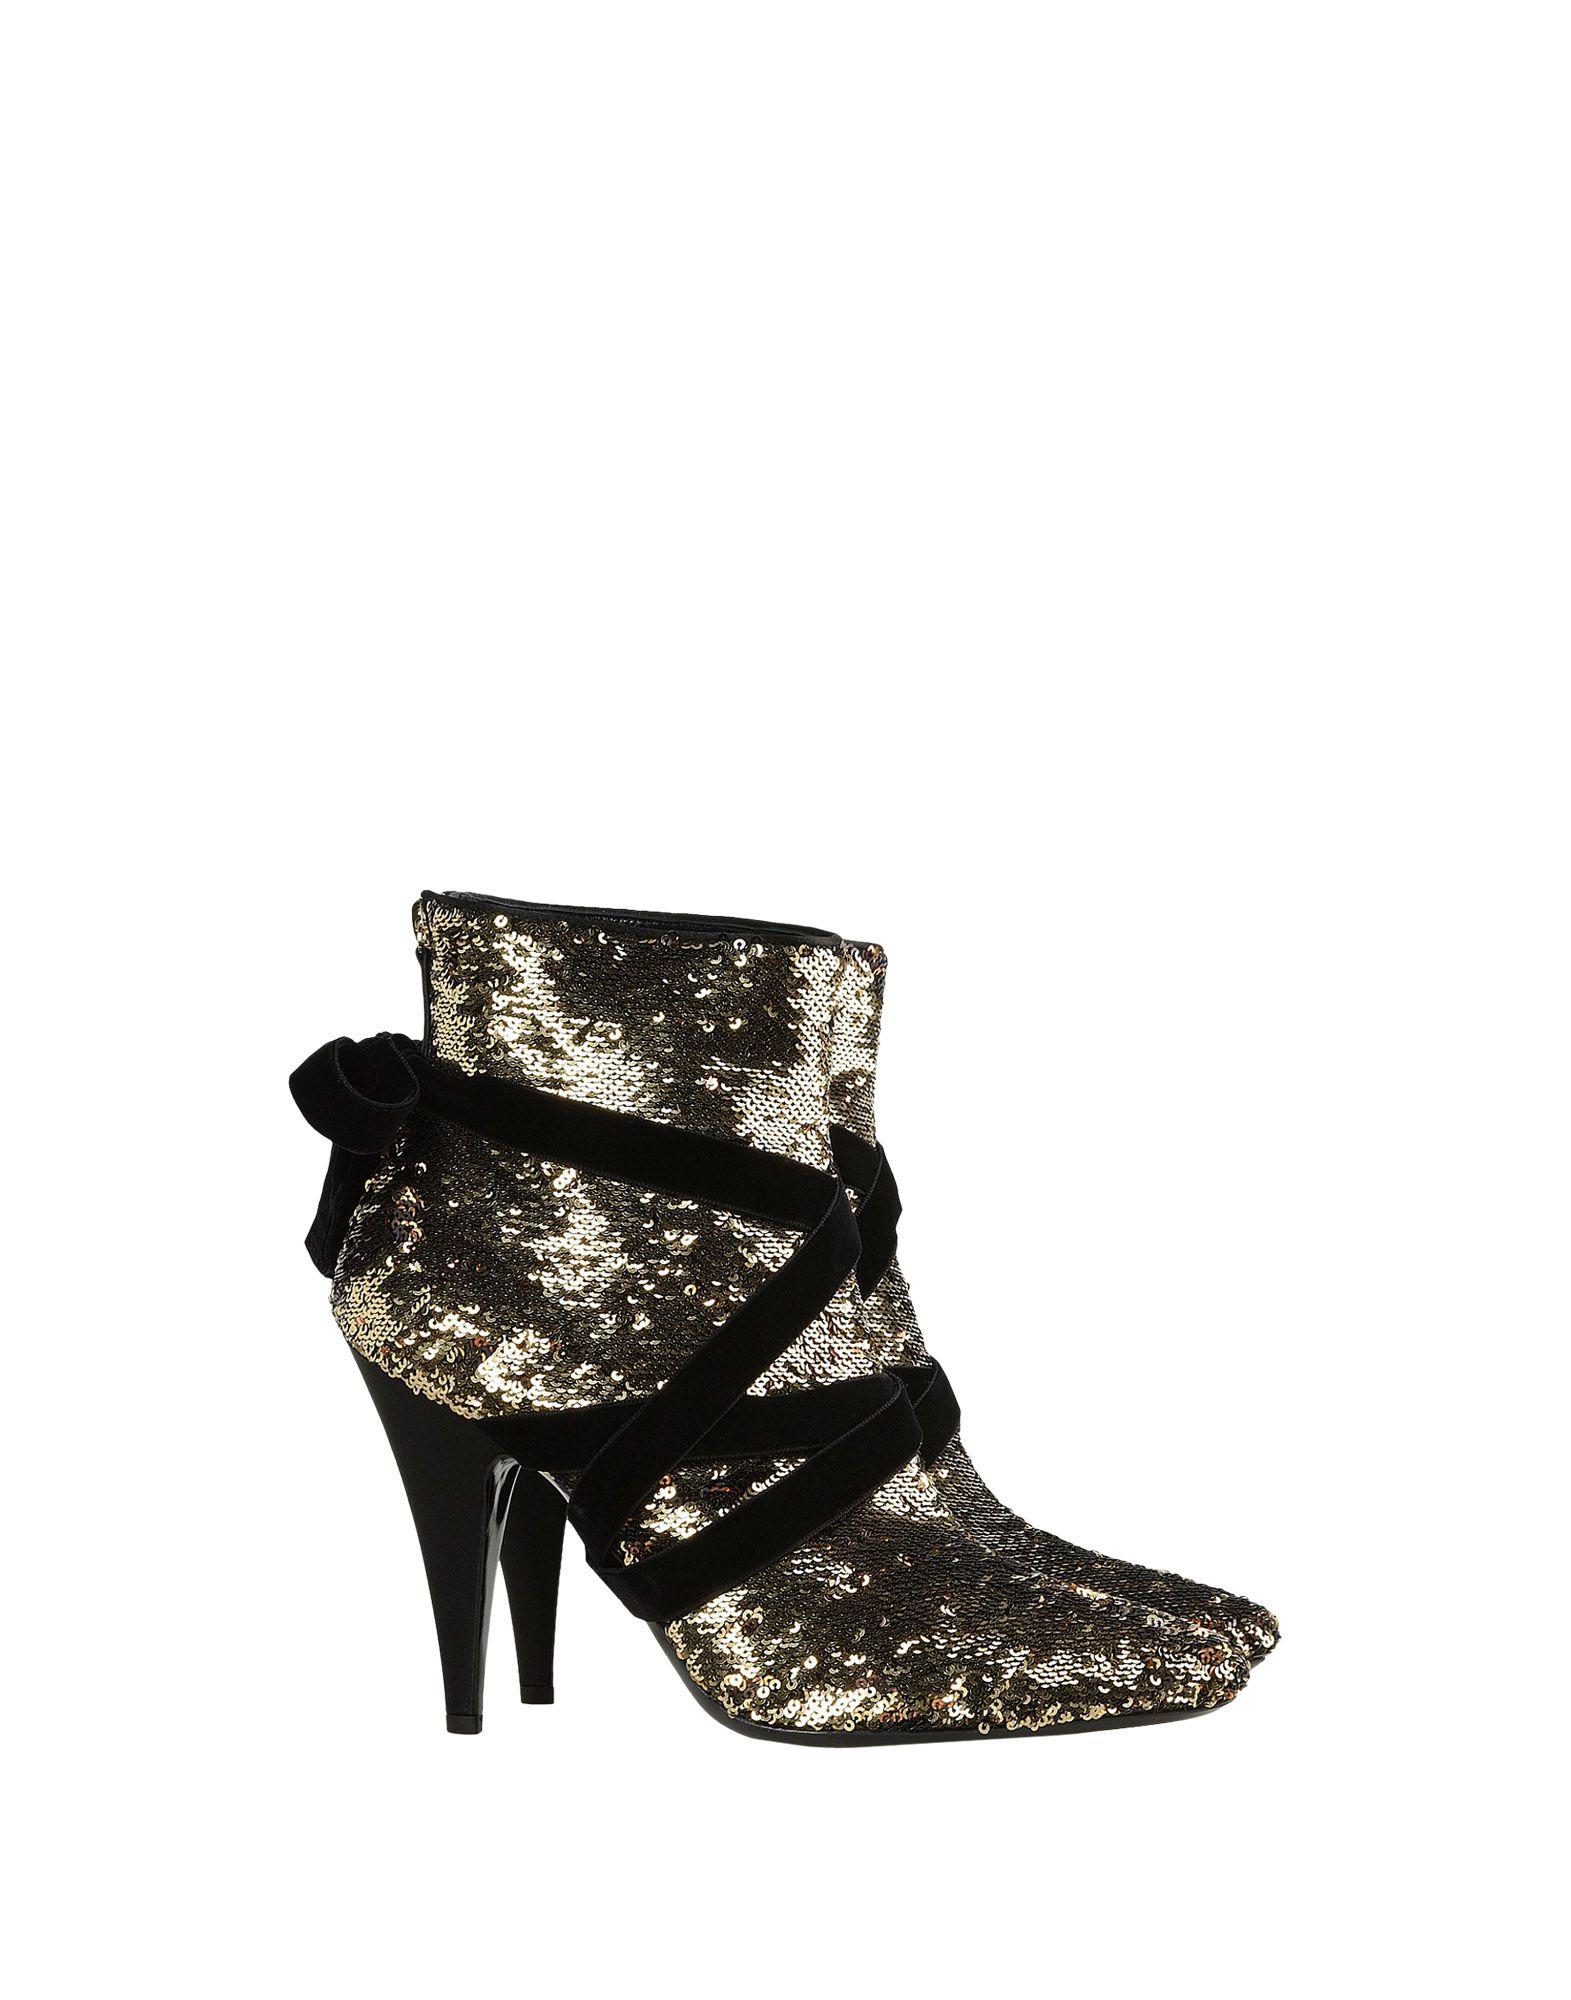 Alberta Ferretti Ankle Boot - Women Alberta Ferretti Ankle Boots - online on  Canada - Boots 11305742BS f29c4b